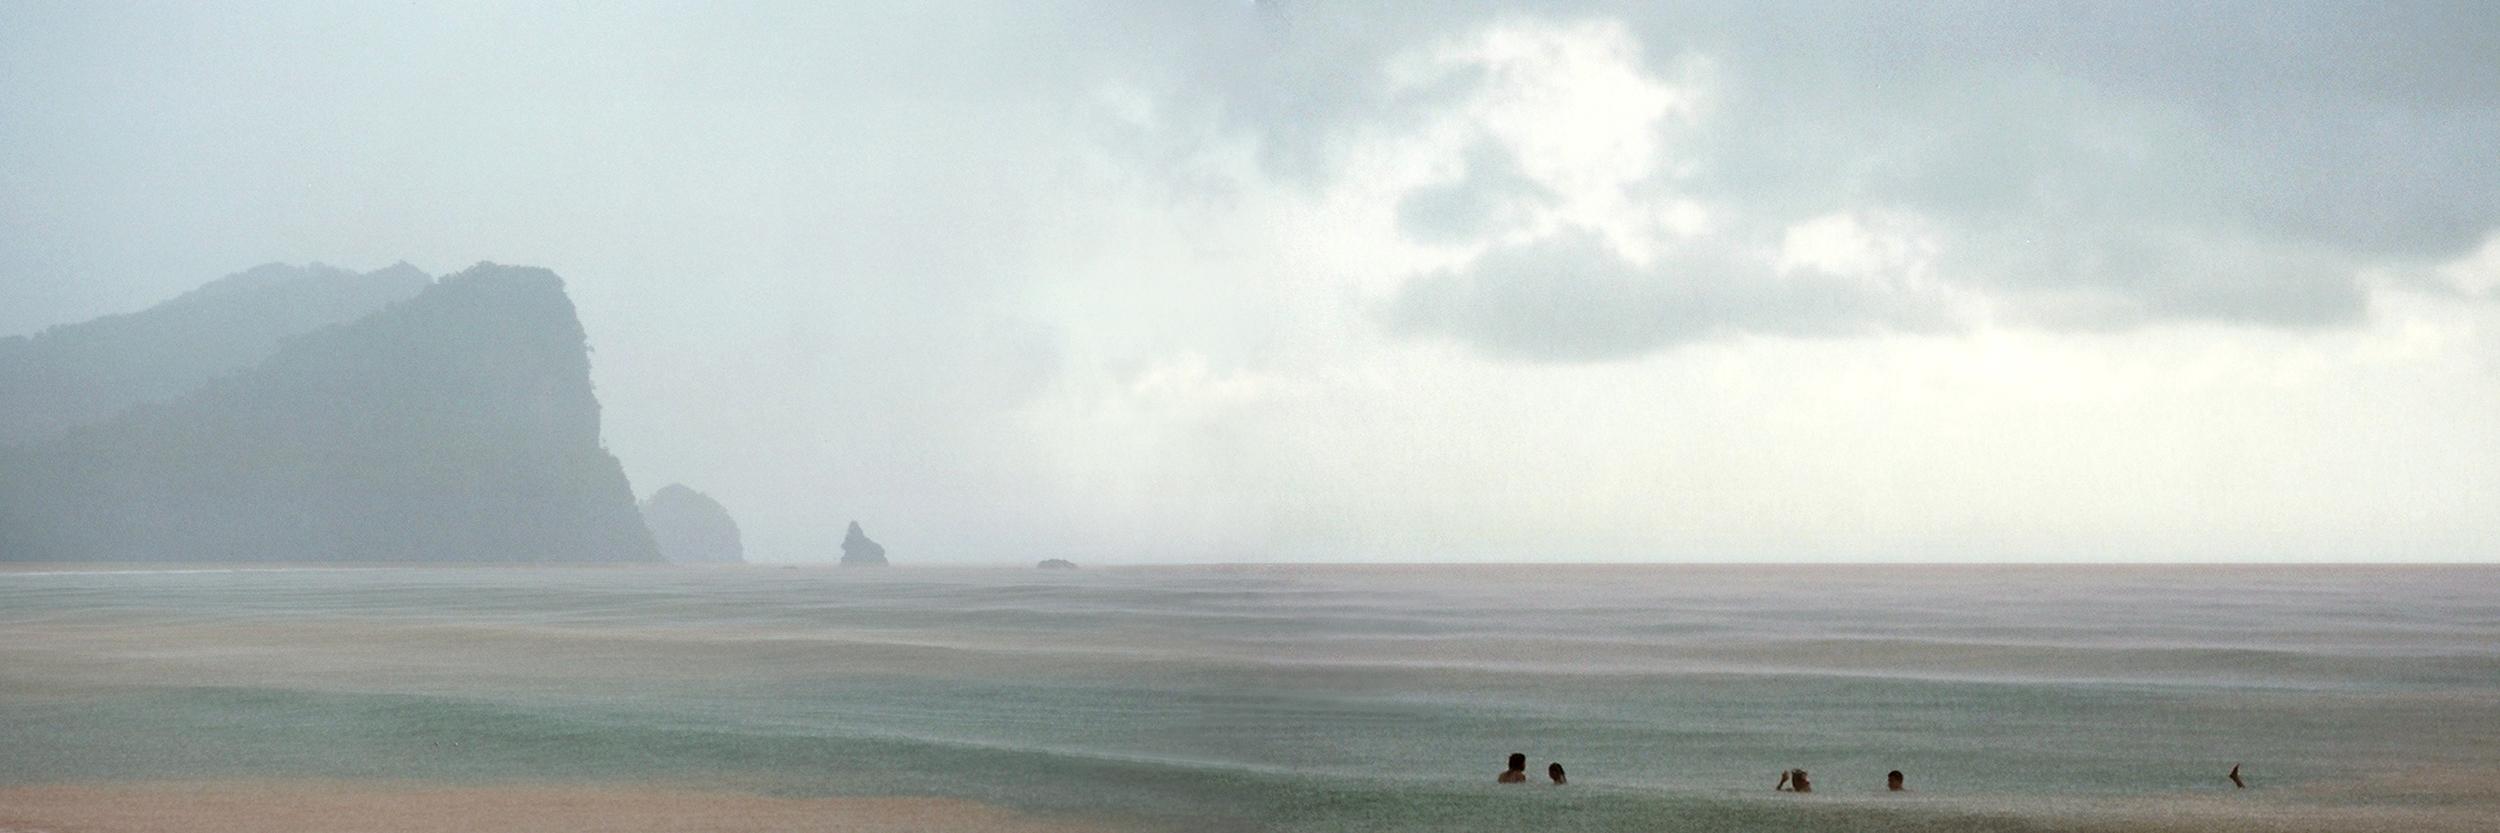 "Congua Panorama II, Venezuela  30"" x 90"",2009"